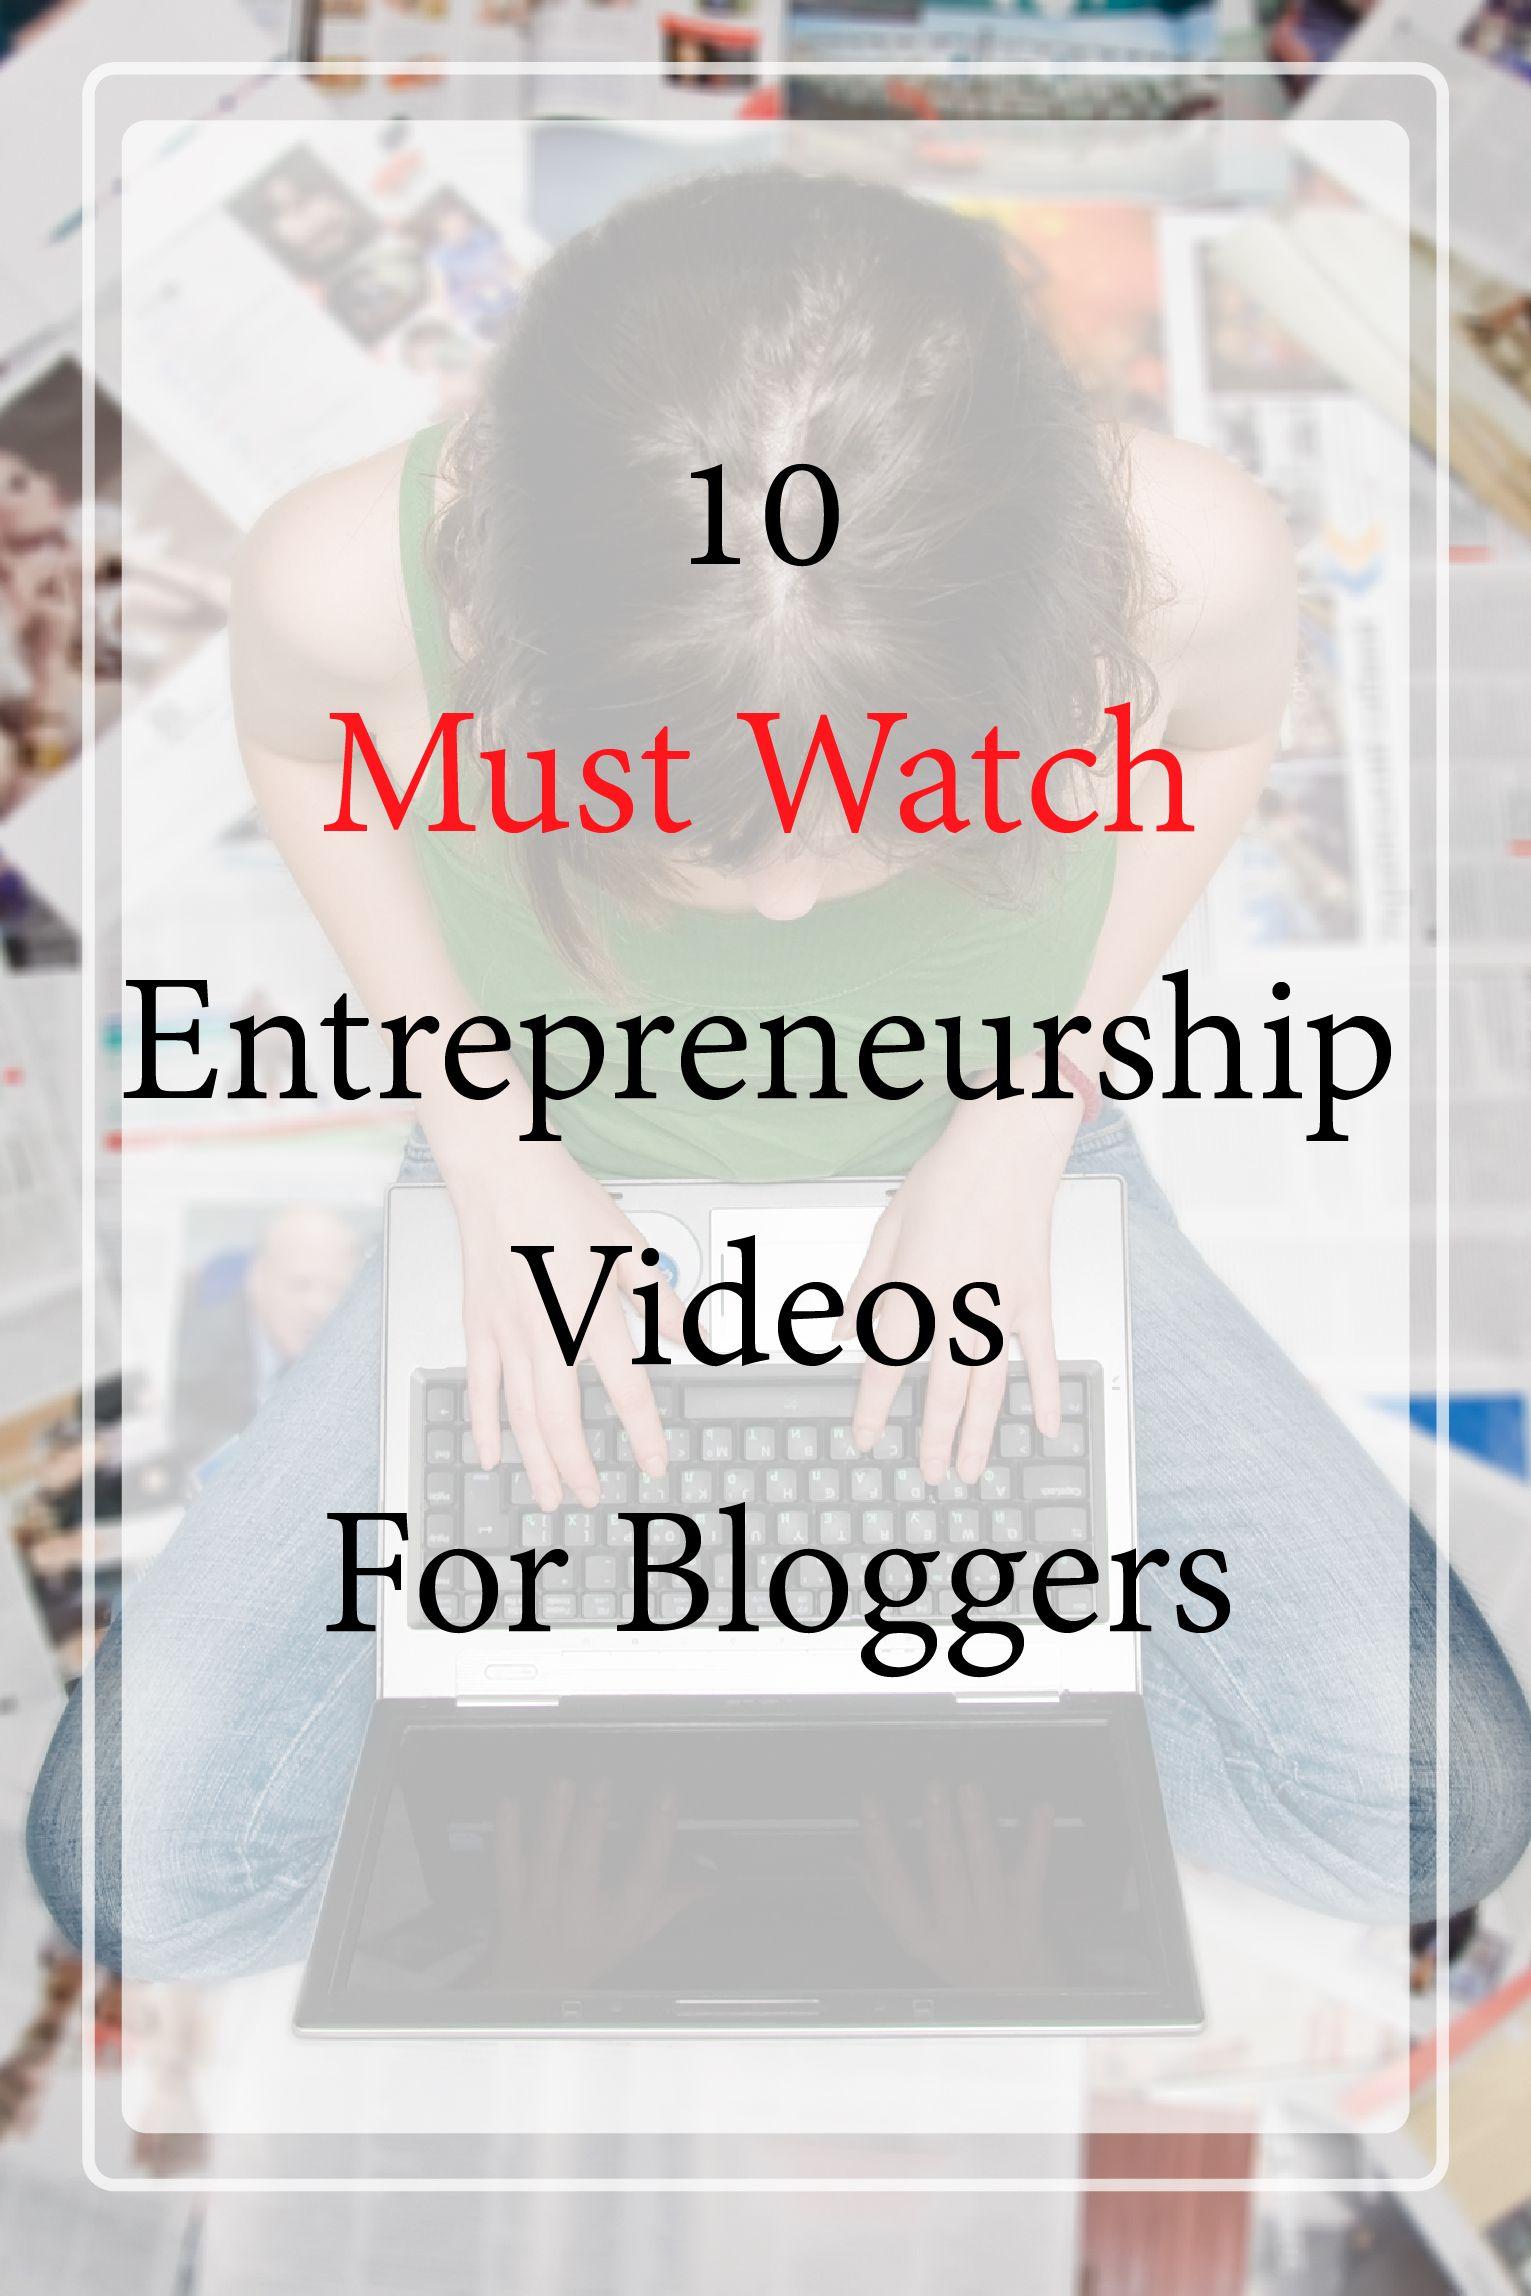 Must Watch Entrepreneurship Videos #Entrepreneurship #bloggers #blogging #mustwatch #Entrepreneur